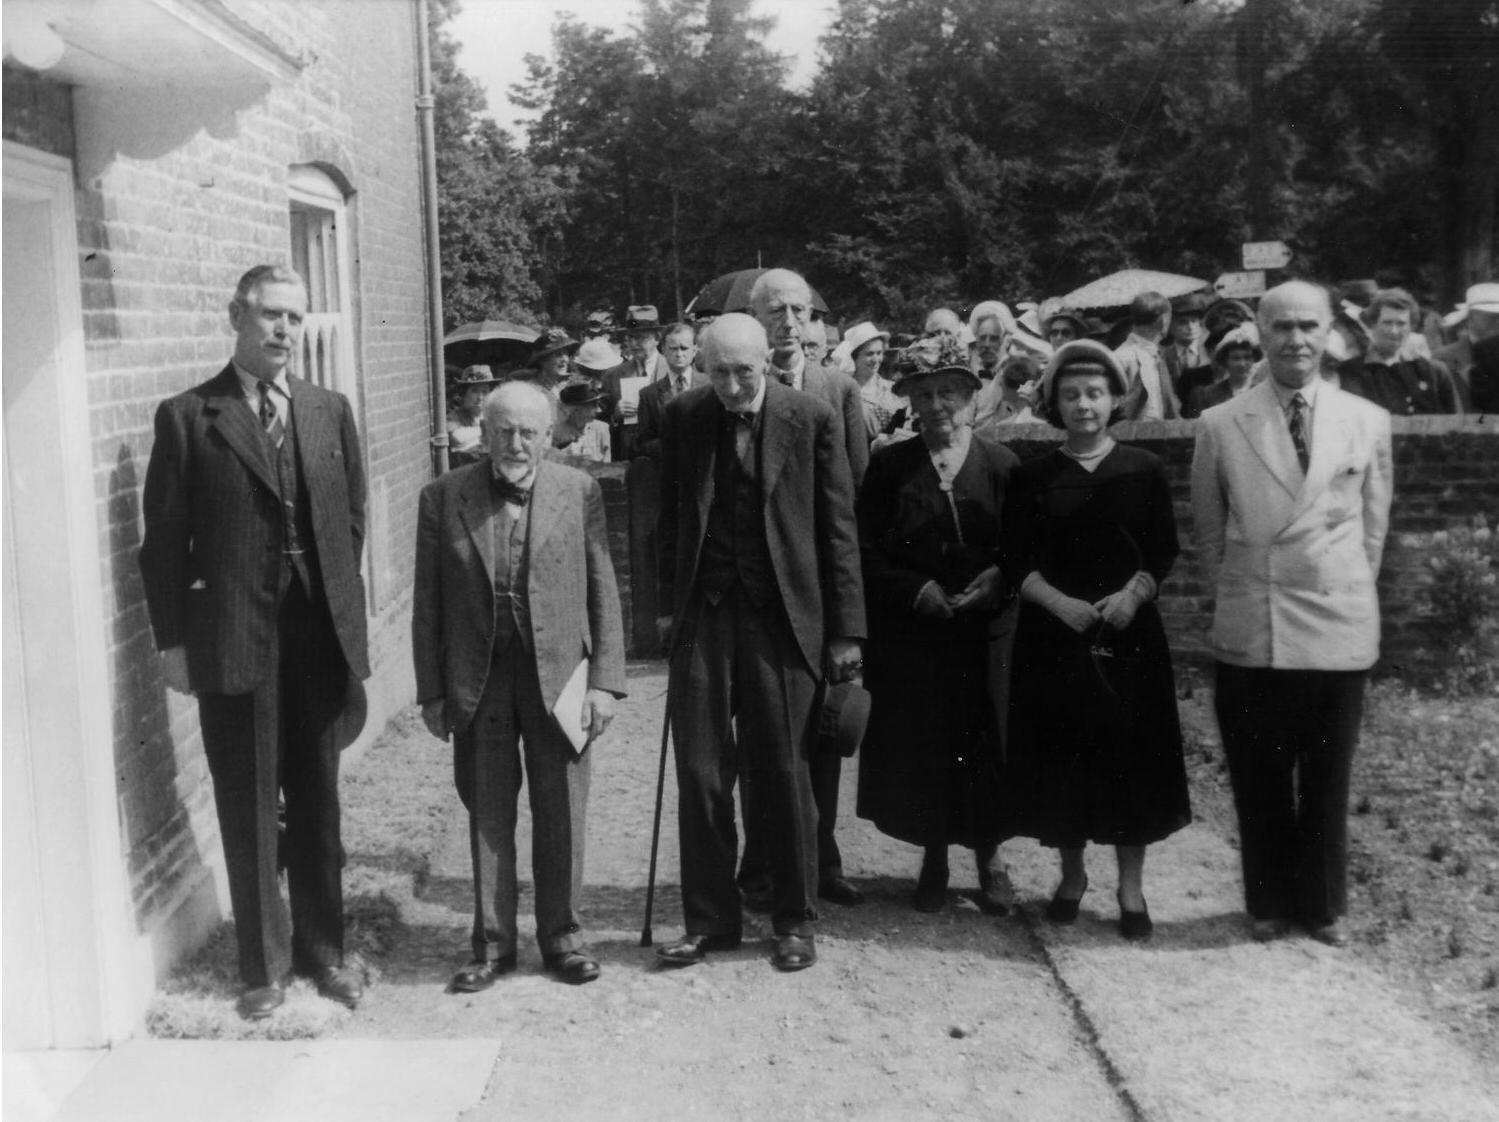 1949-Museum-Grand-Opening.-L-to-R-7th-Duke-of-Wellington-T-E-Carpenter-R-W-Chapman-Dorothy-Darnell-Elizabeth-Jenkins-Richard-Arthur-Austen-Leigh